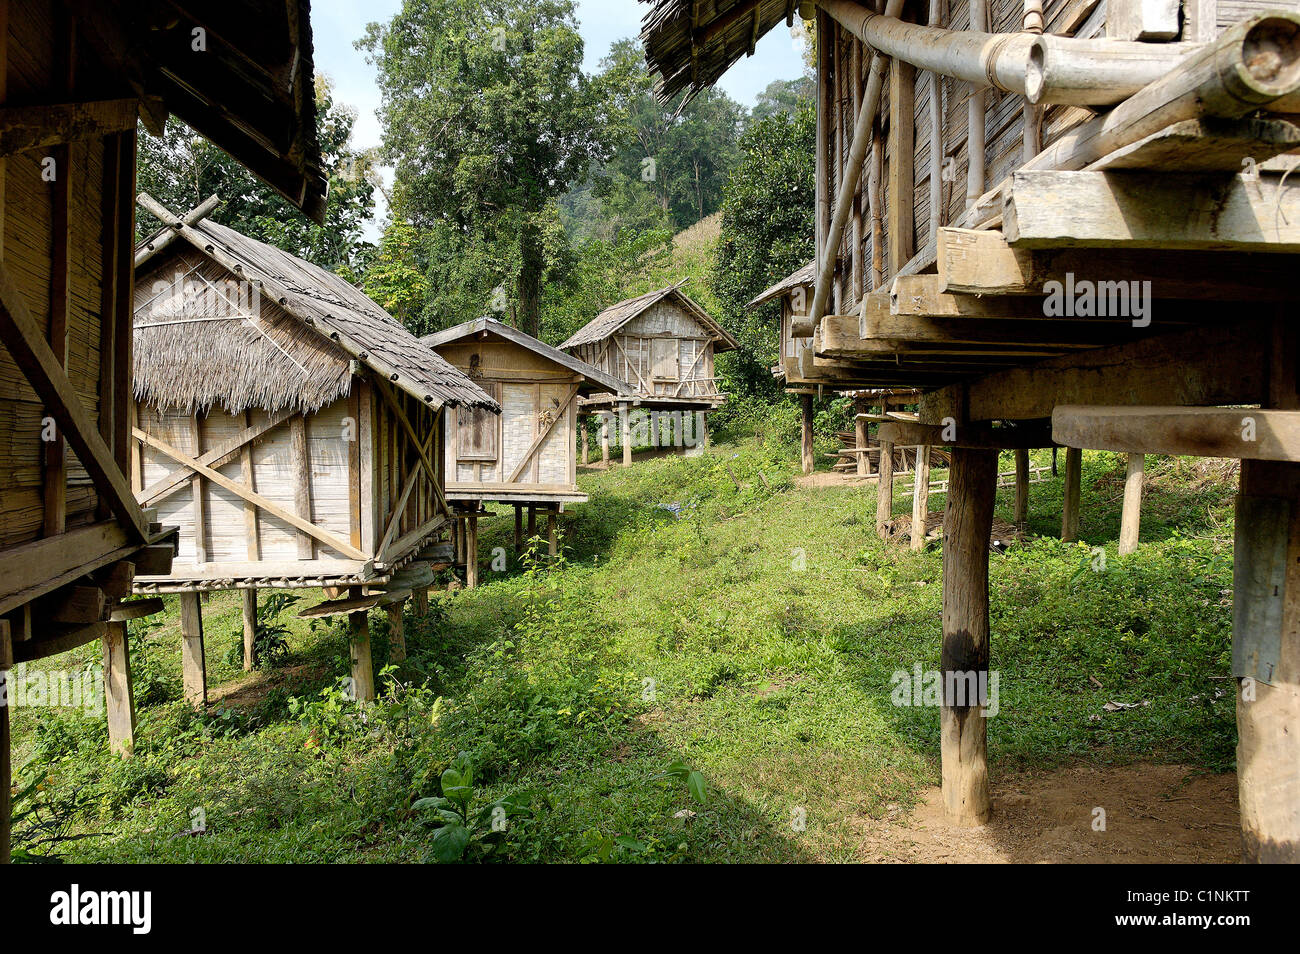 Laos, provincia de Oudomxai, Kamu grupo étnico village, en el barrio de Pakbeng Foto de stock